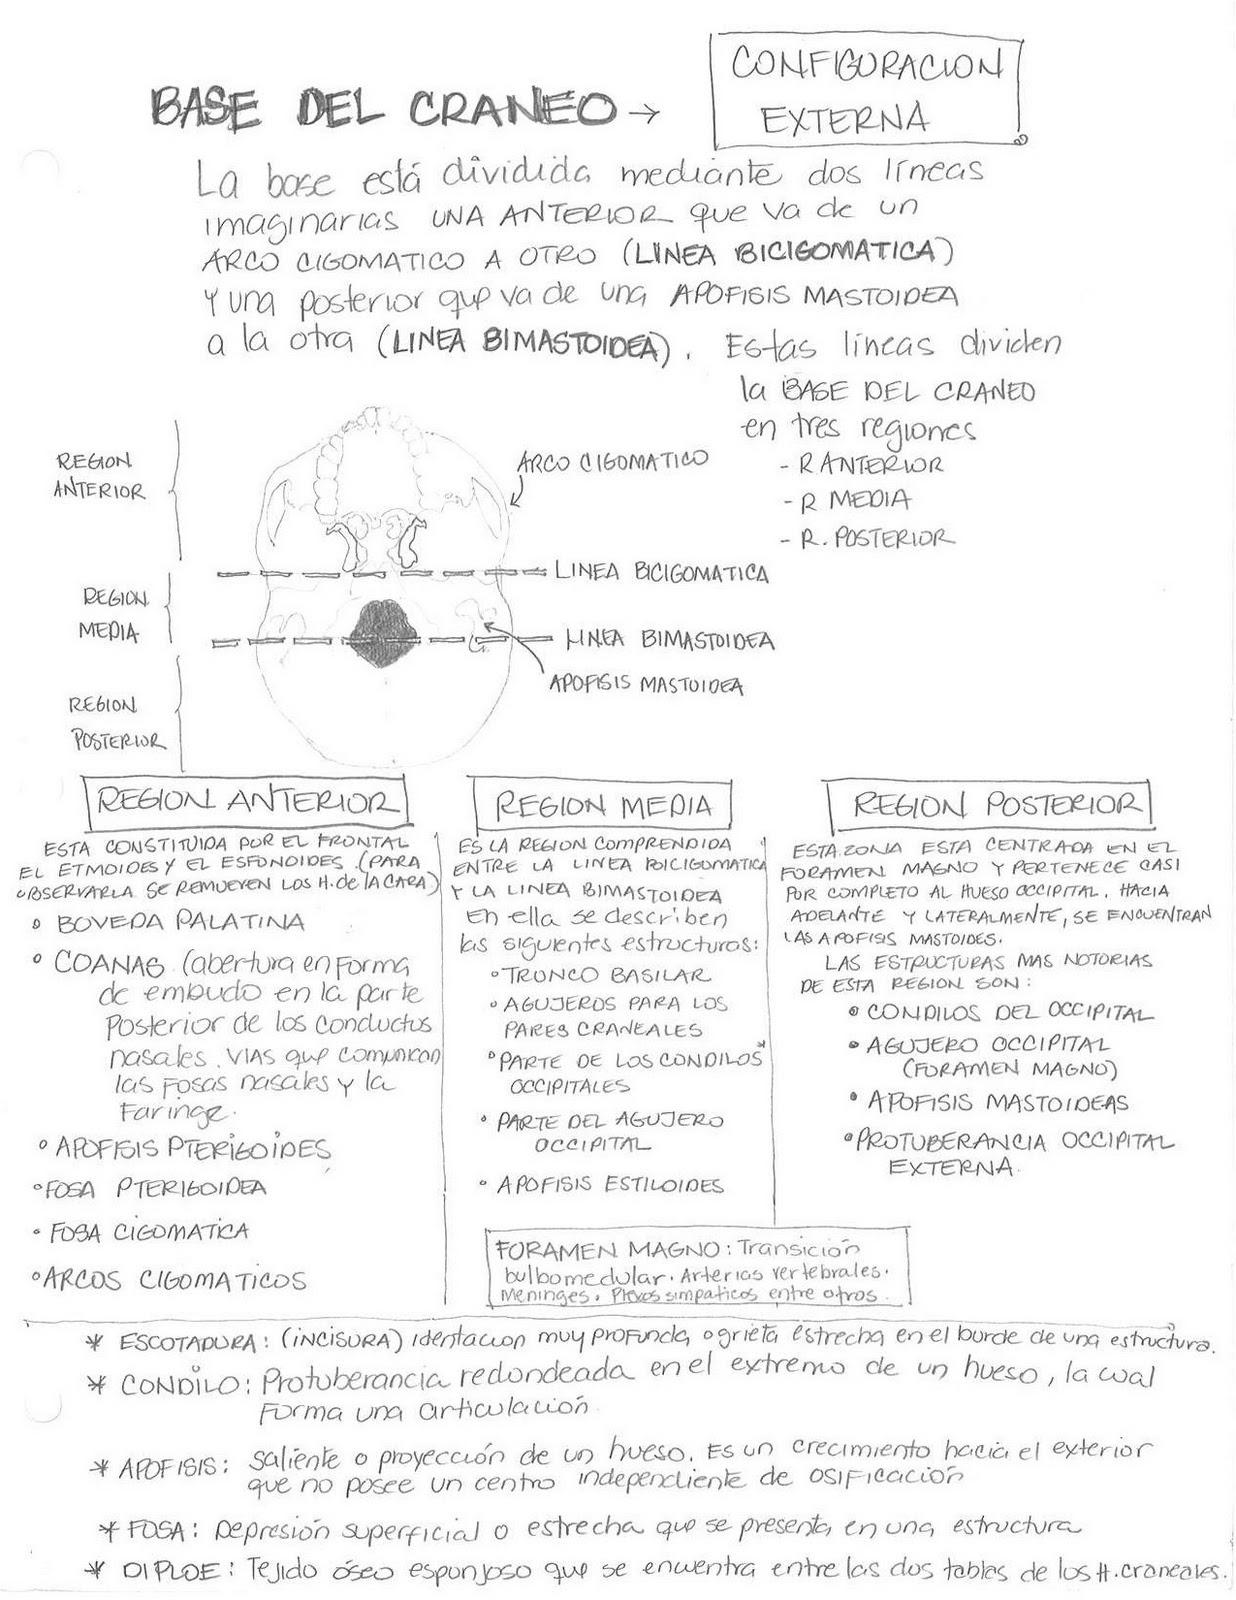 Anatomía Humana... Para Humanos: Sistema Oseo - Base del Craneo